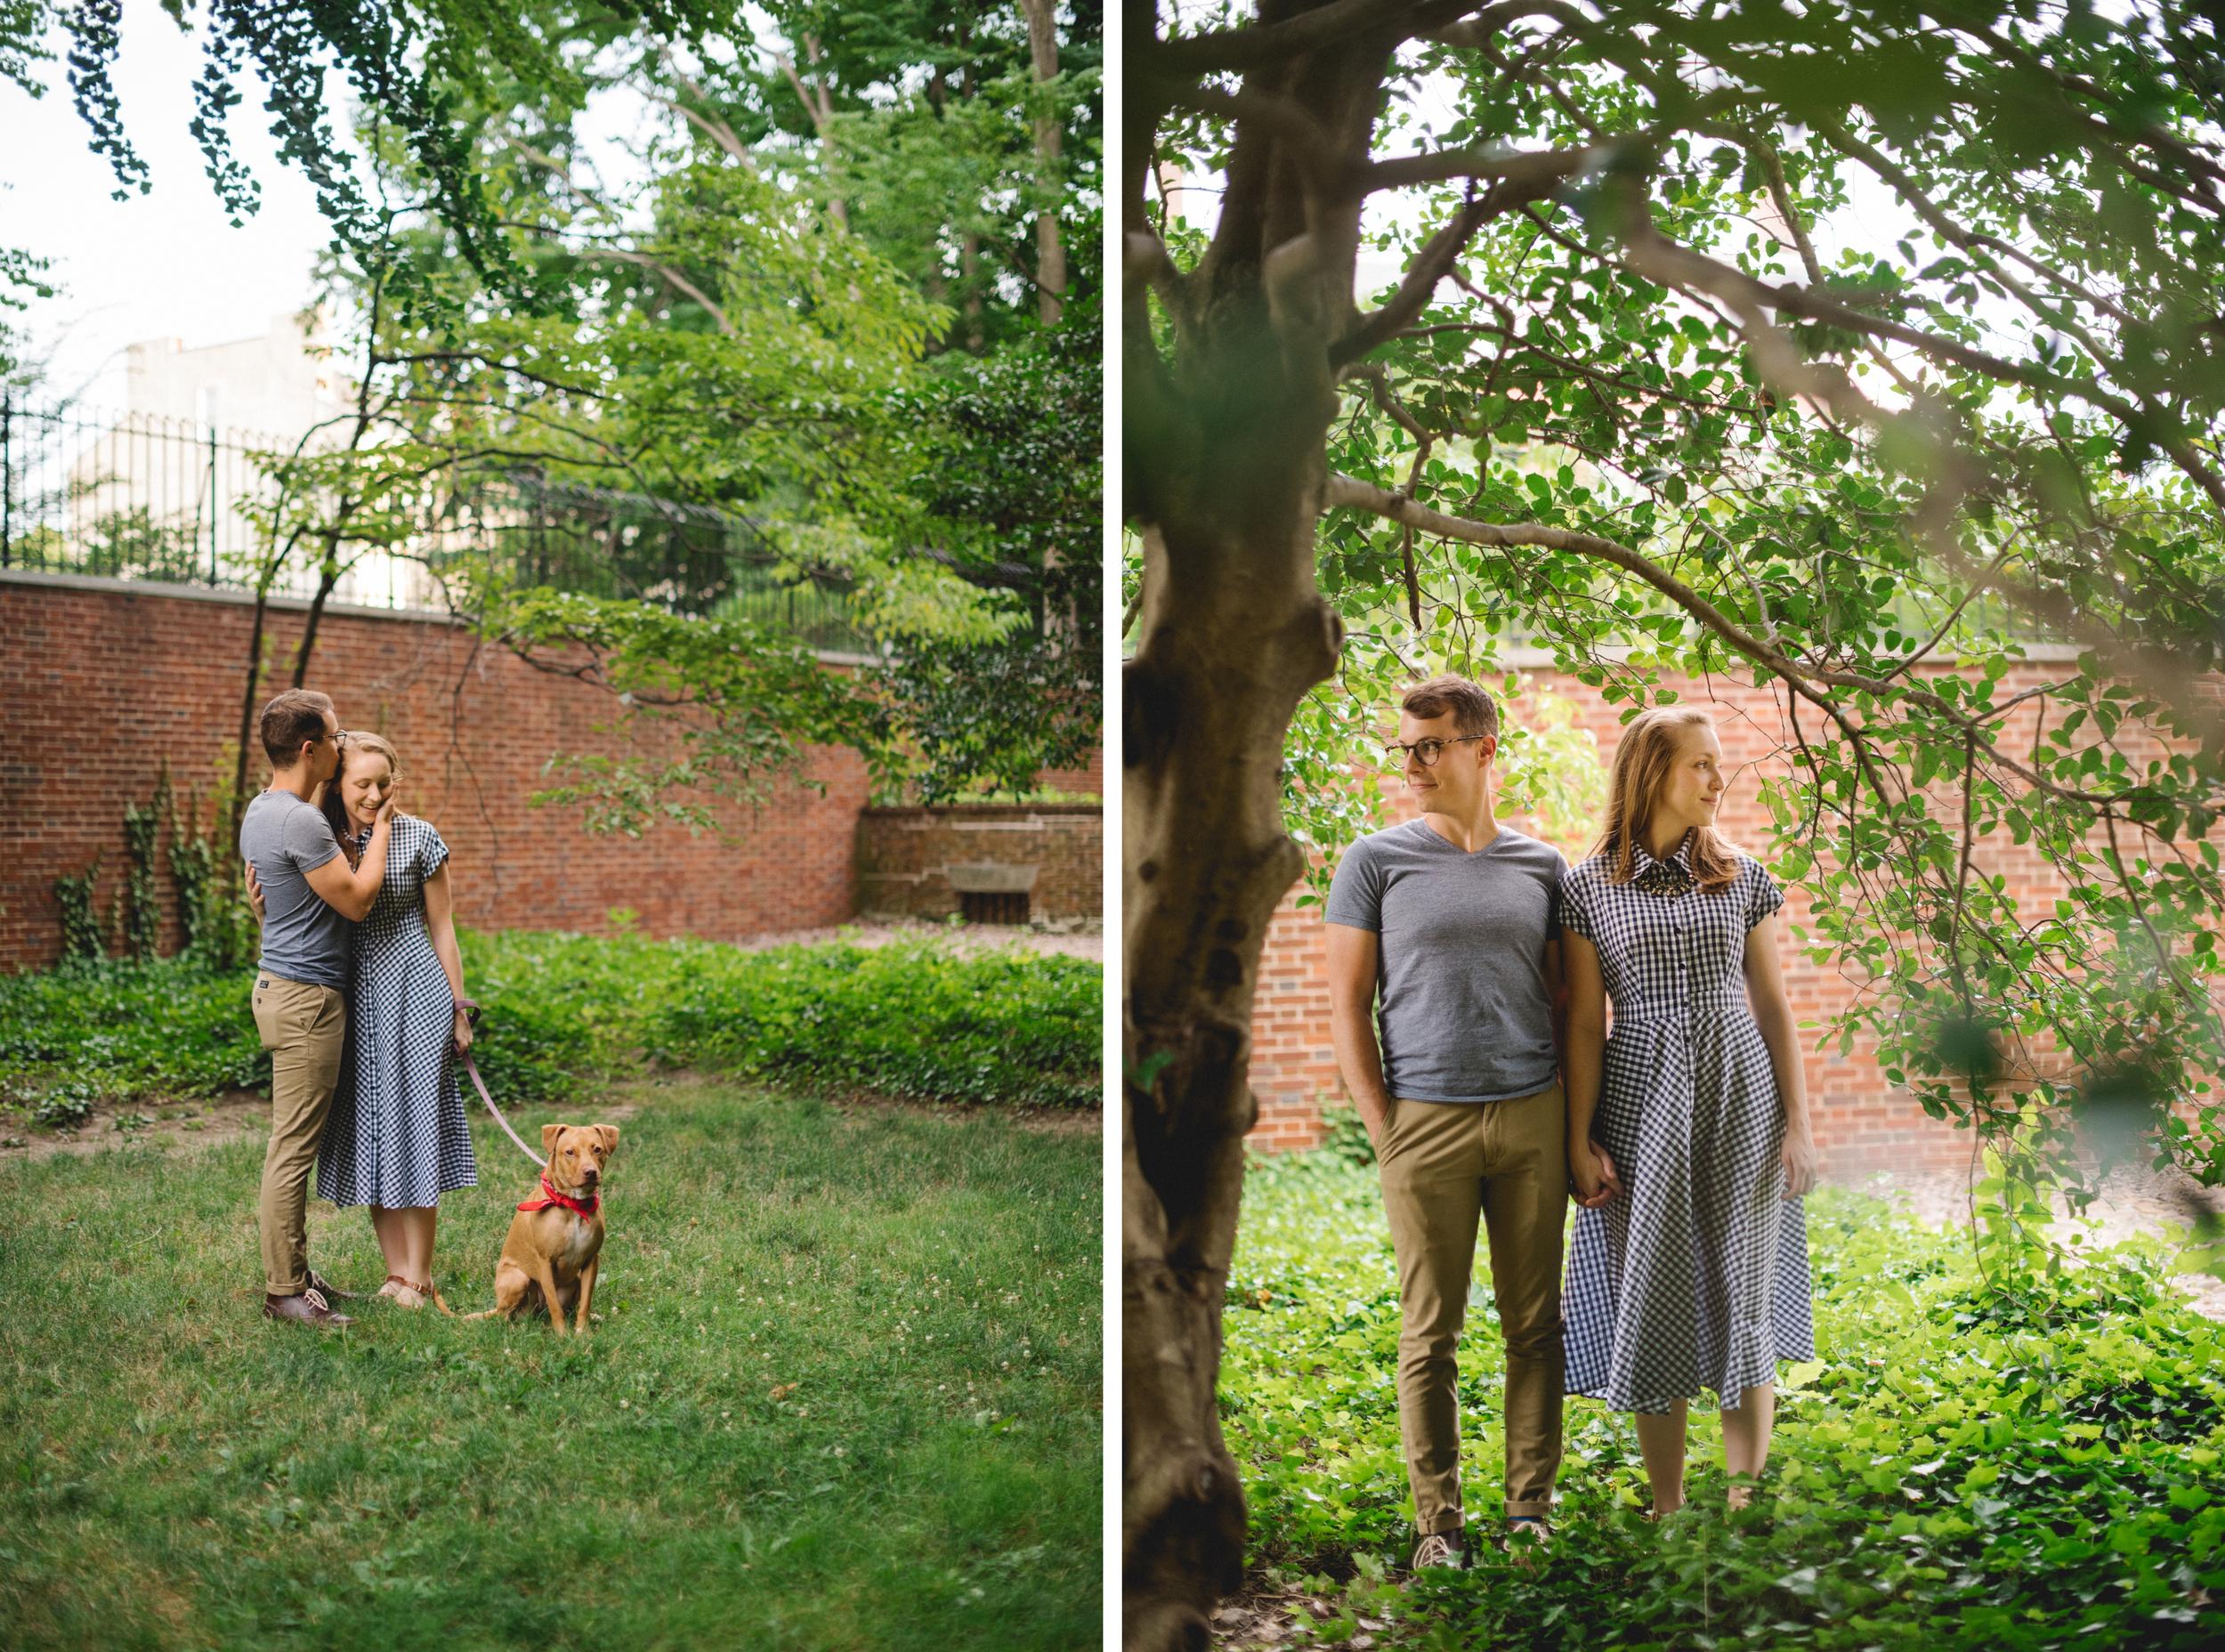 Peaberry-Photography-Society-Hill-Philadelphia-Pennsylvania-Newlyweds-Just-Married-003.jpg